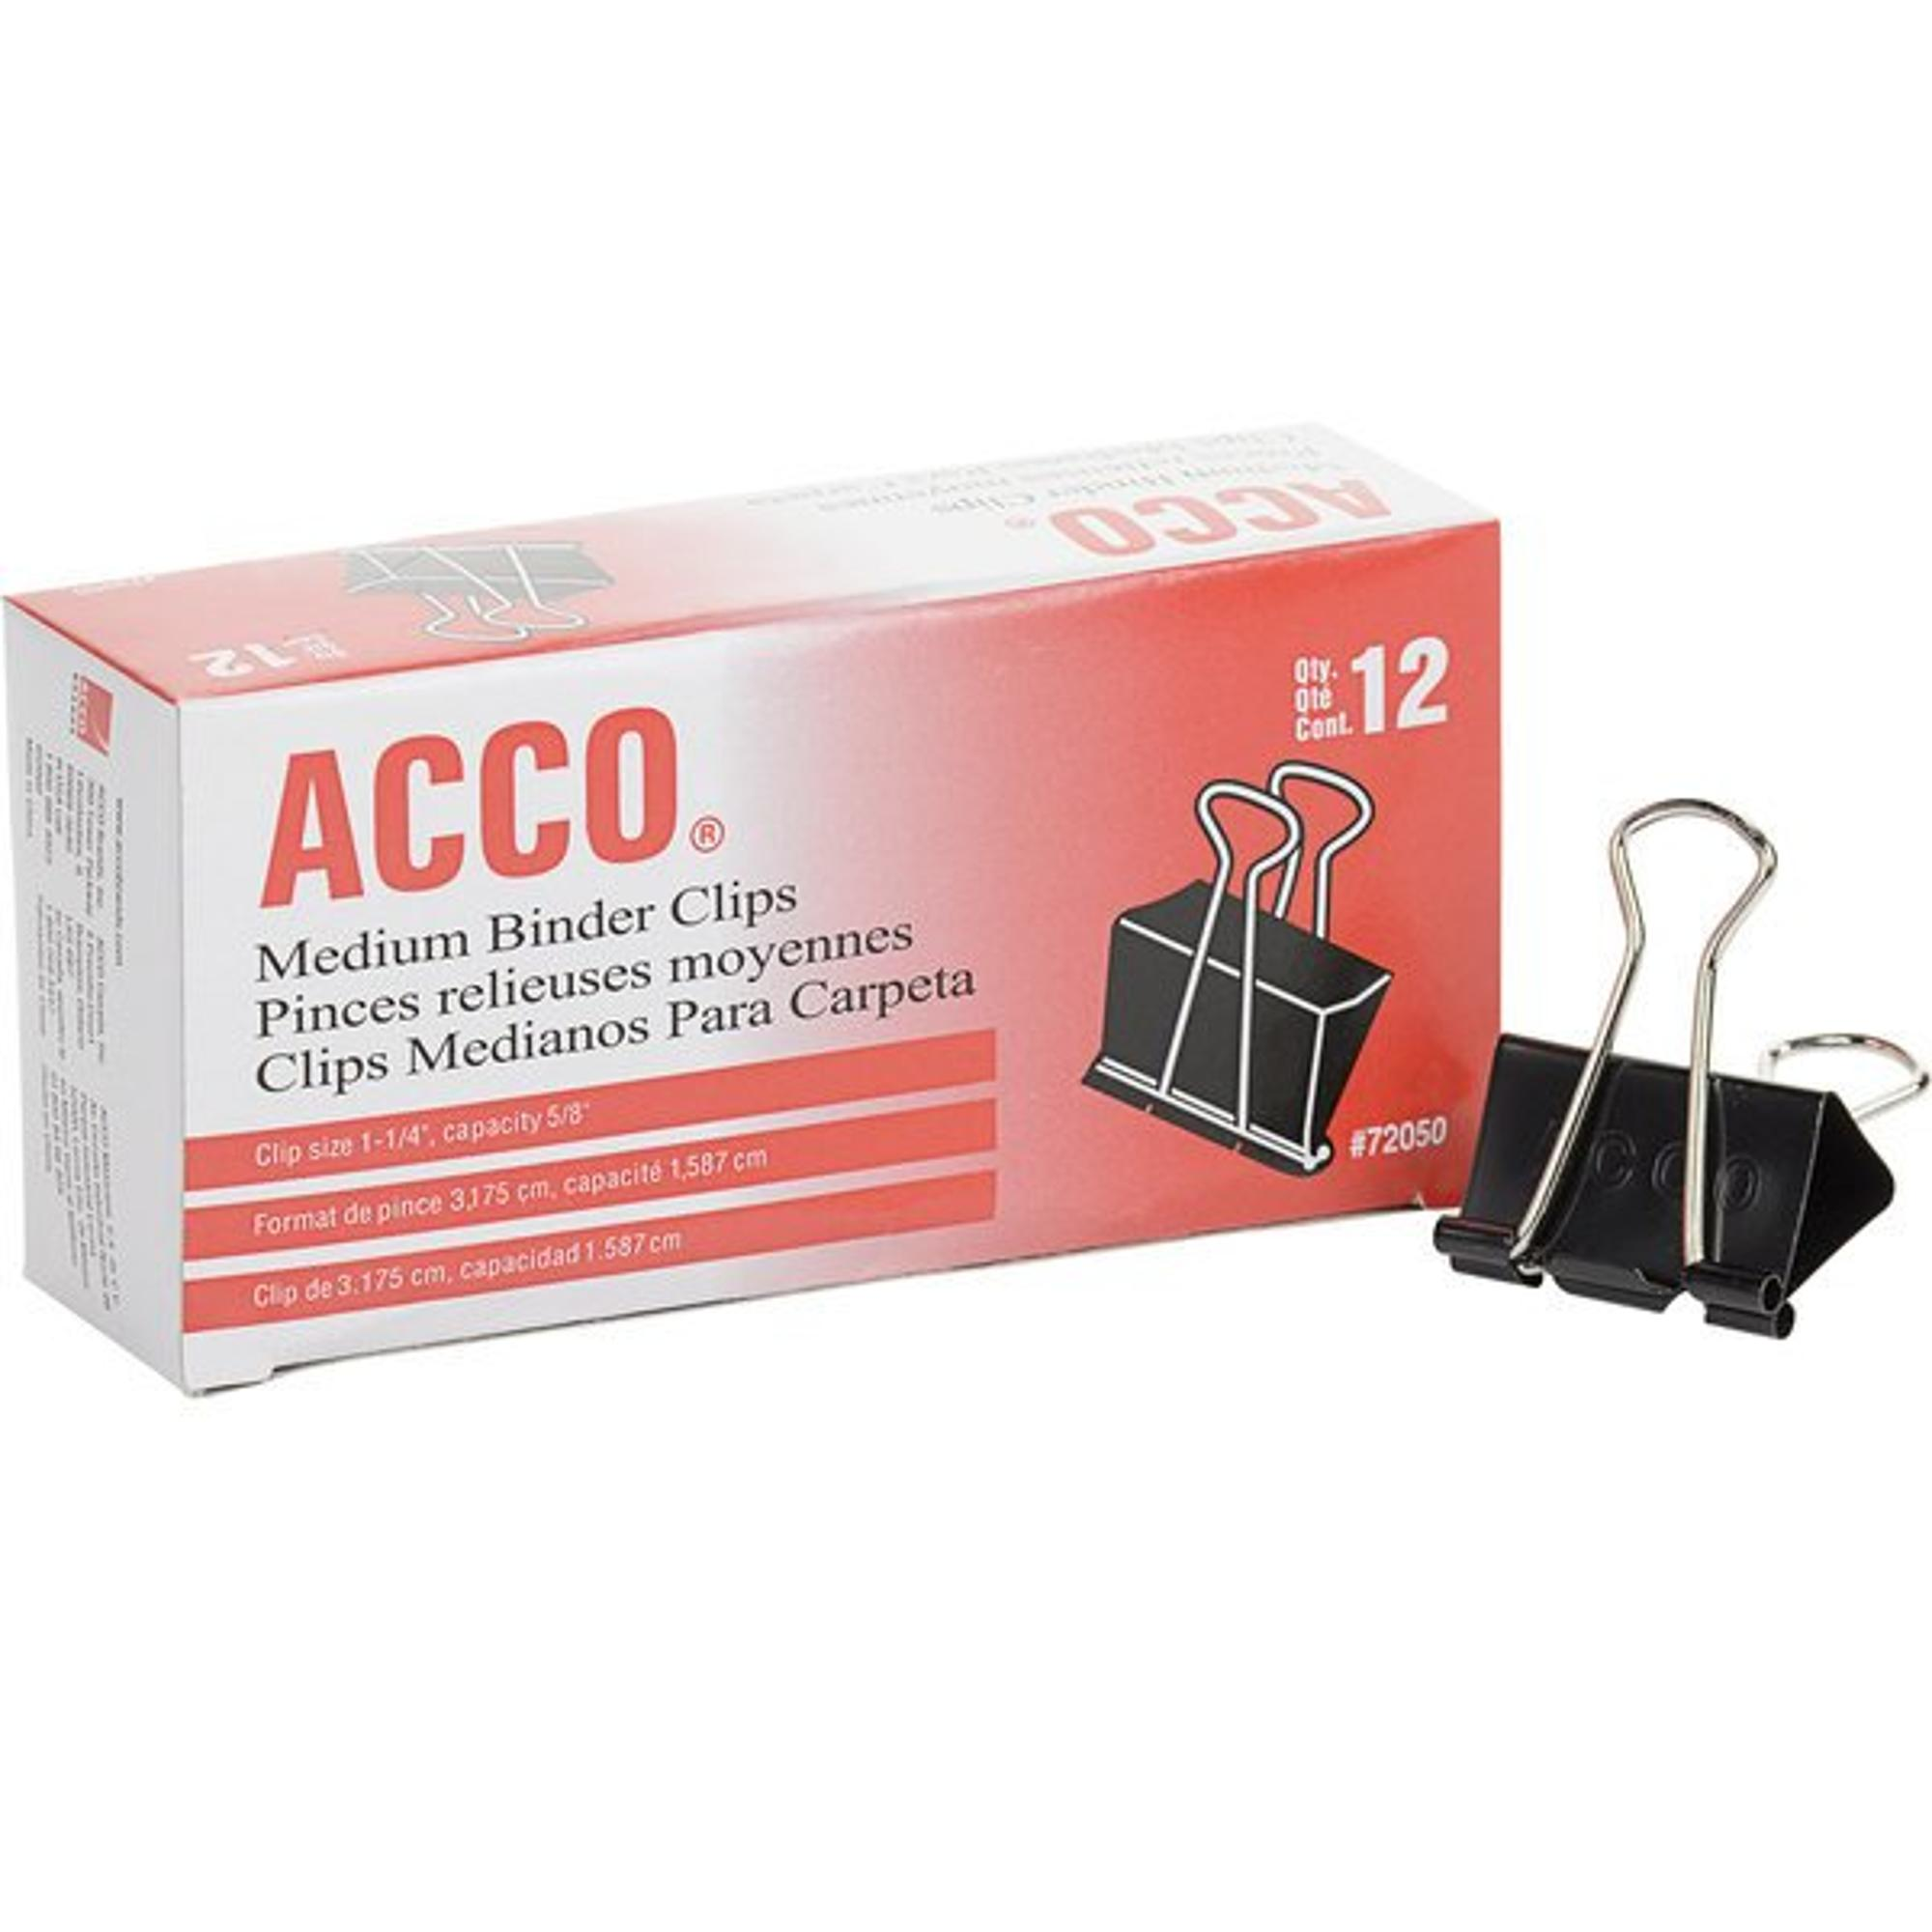 image of: ACCO Medium Binder Clips